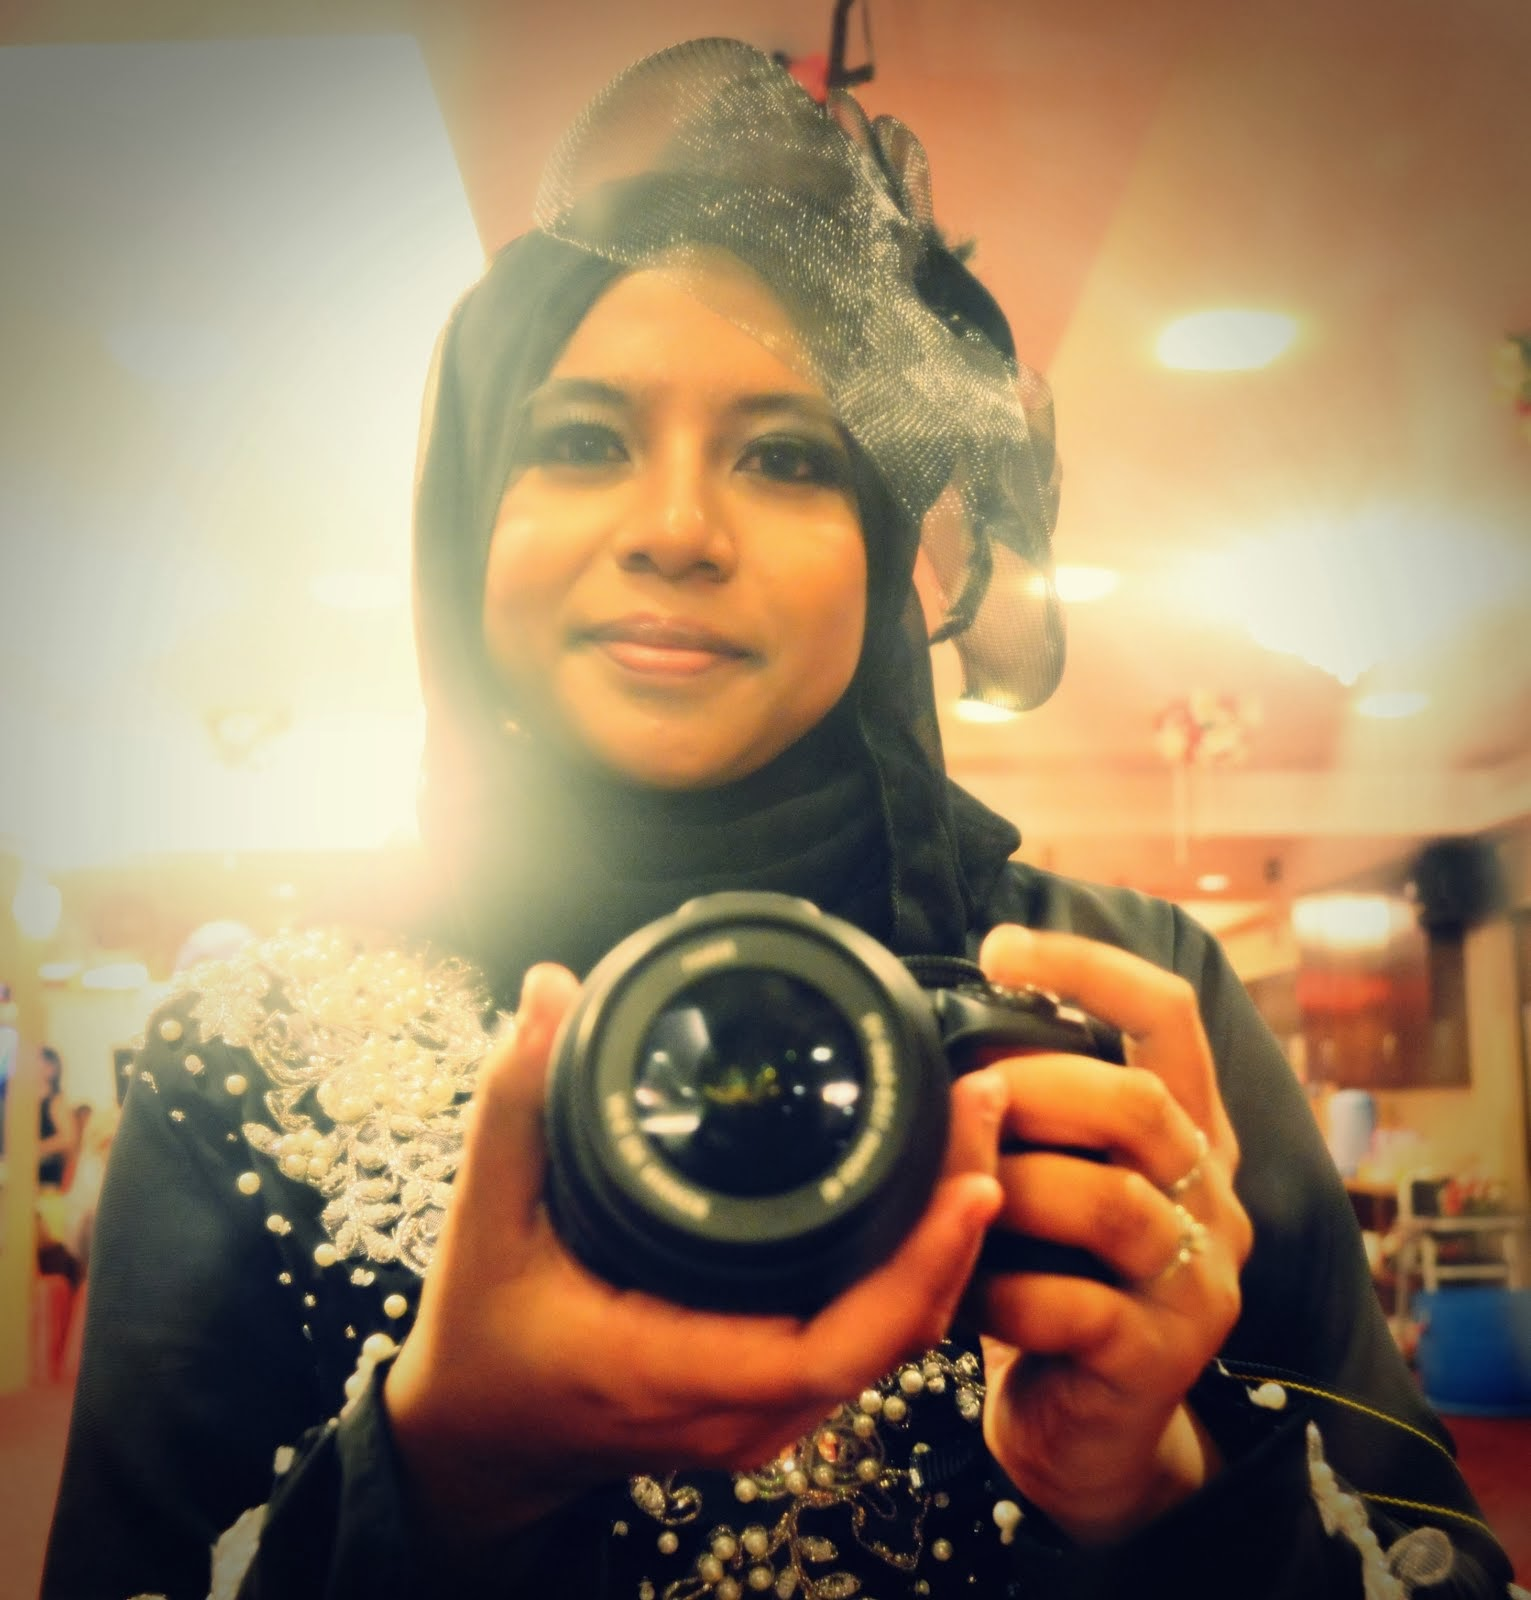 Snap2 = Me!